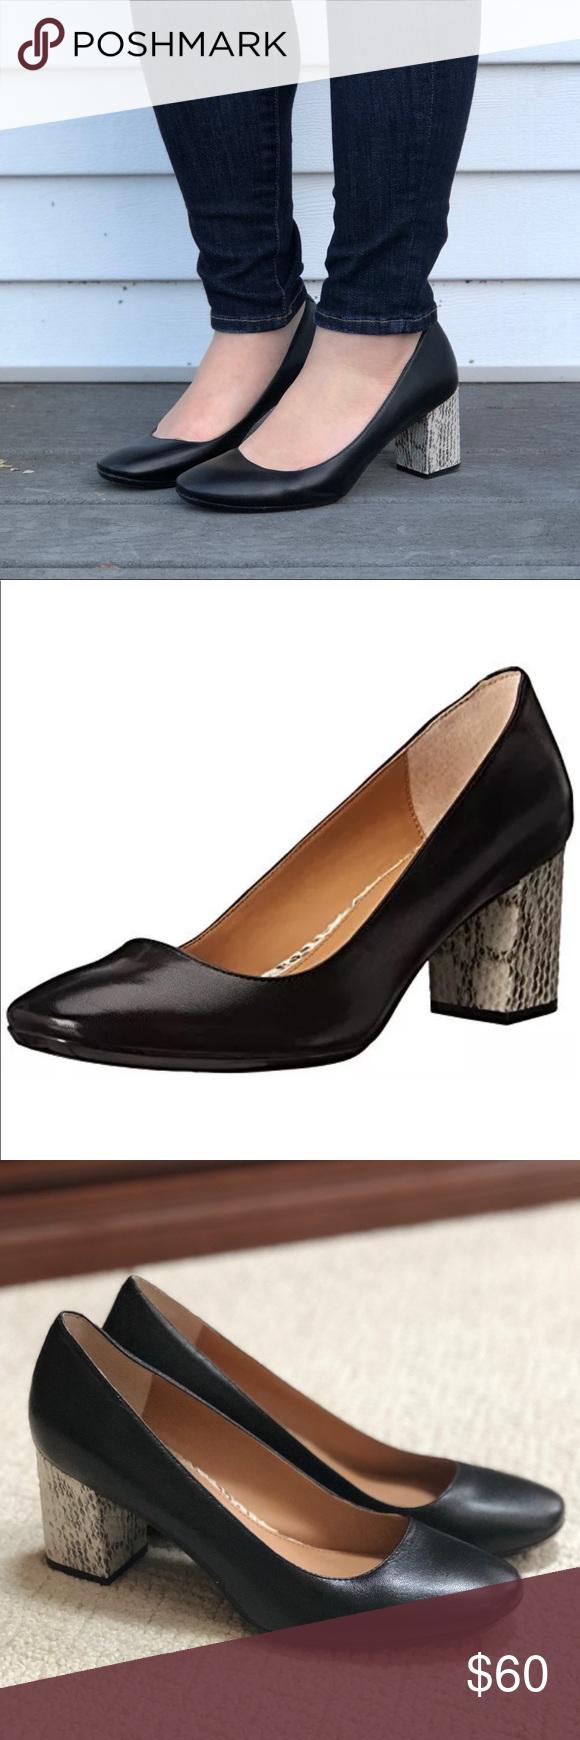 a63c05147b ✨SALE✨ Calvin Klein Cirilla Snake Heel Pump Calvin Klein Black Leather Pump  with Snakeskin Block Heel NWOT Cirilla style, slip-on, muted snake block  heel, ...